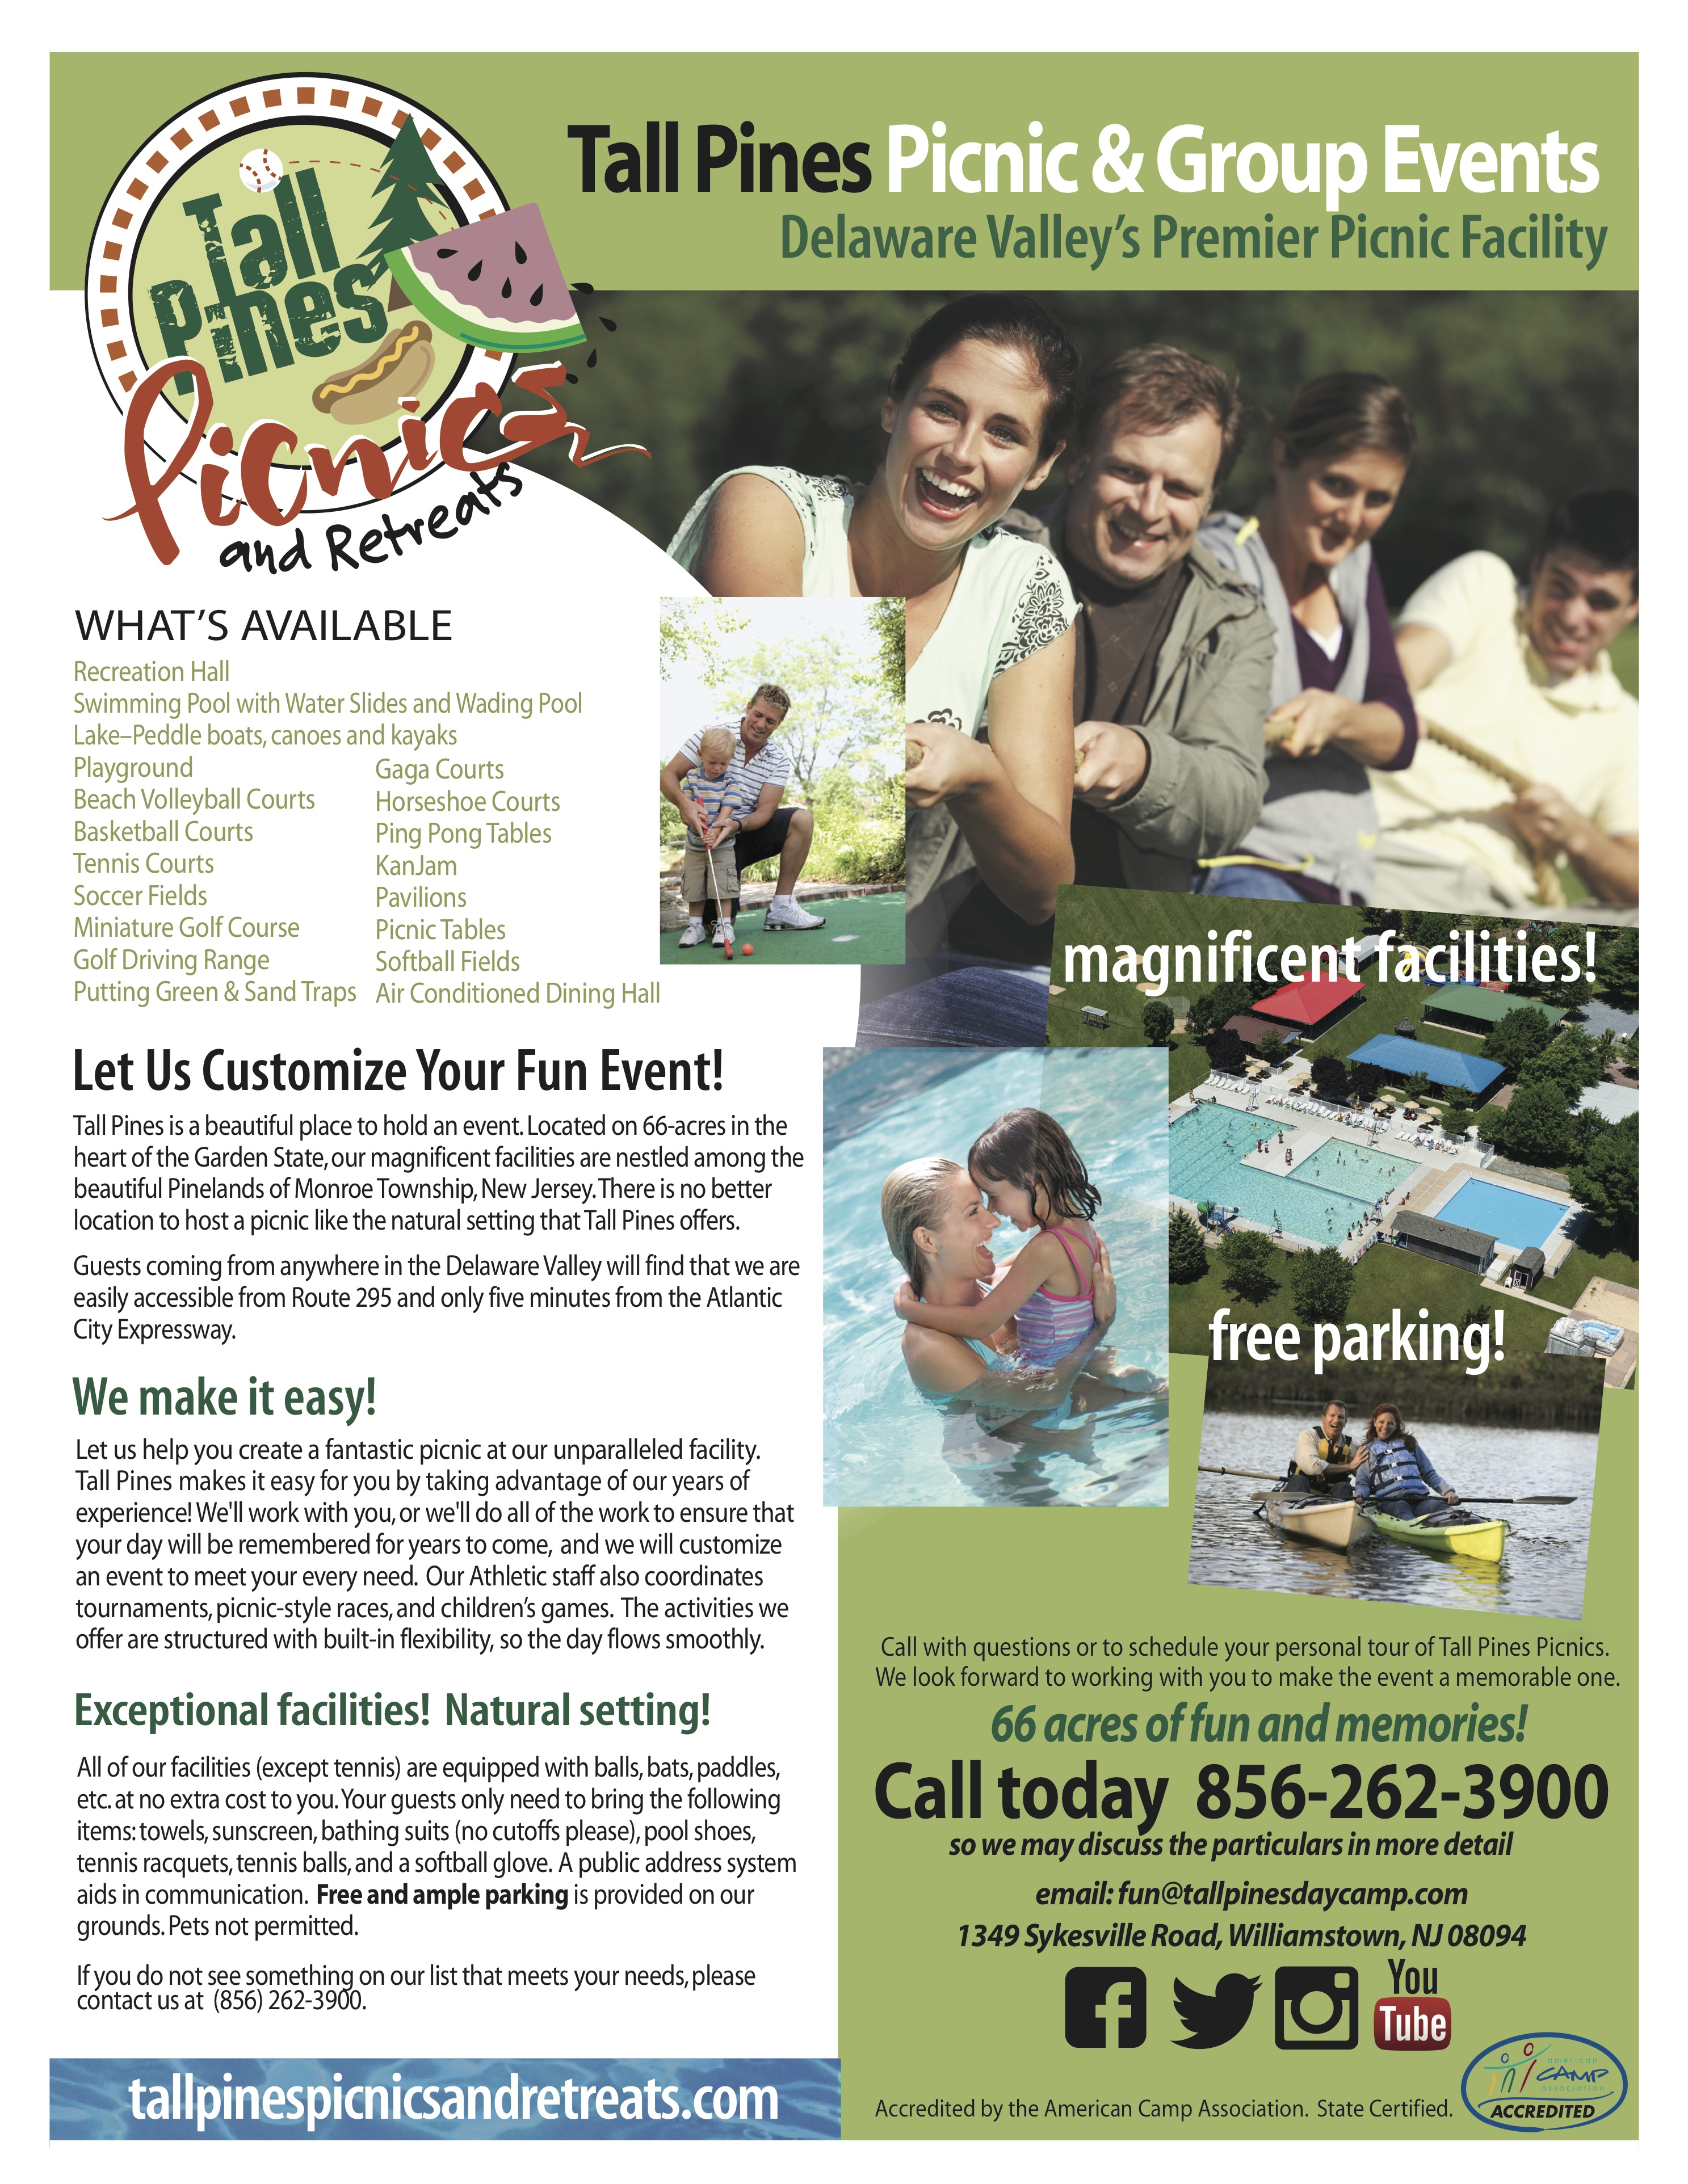 2017-tall-pines-picnics-page-2